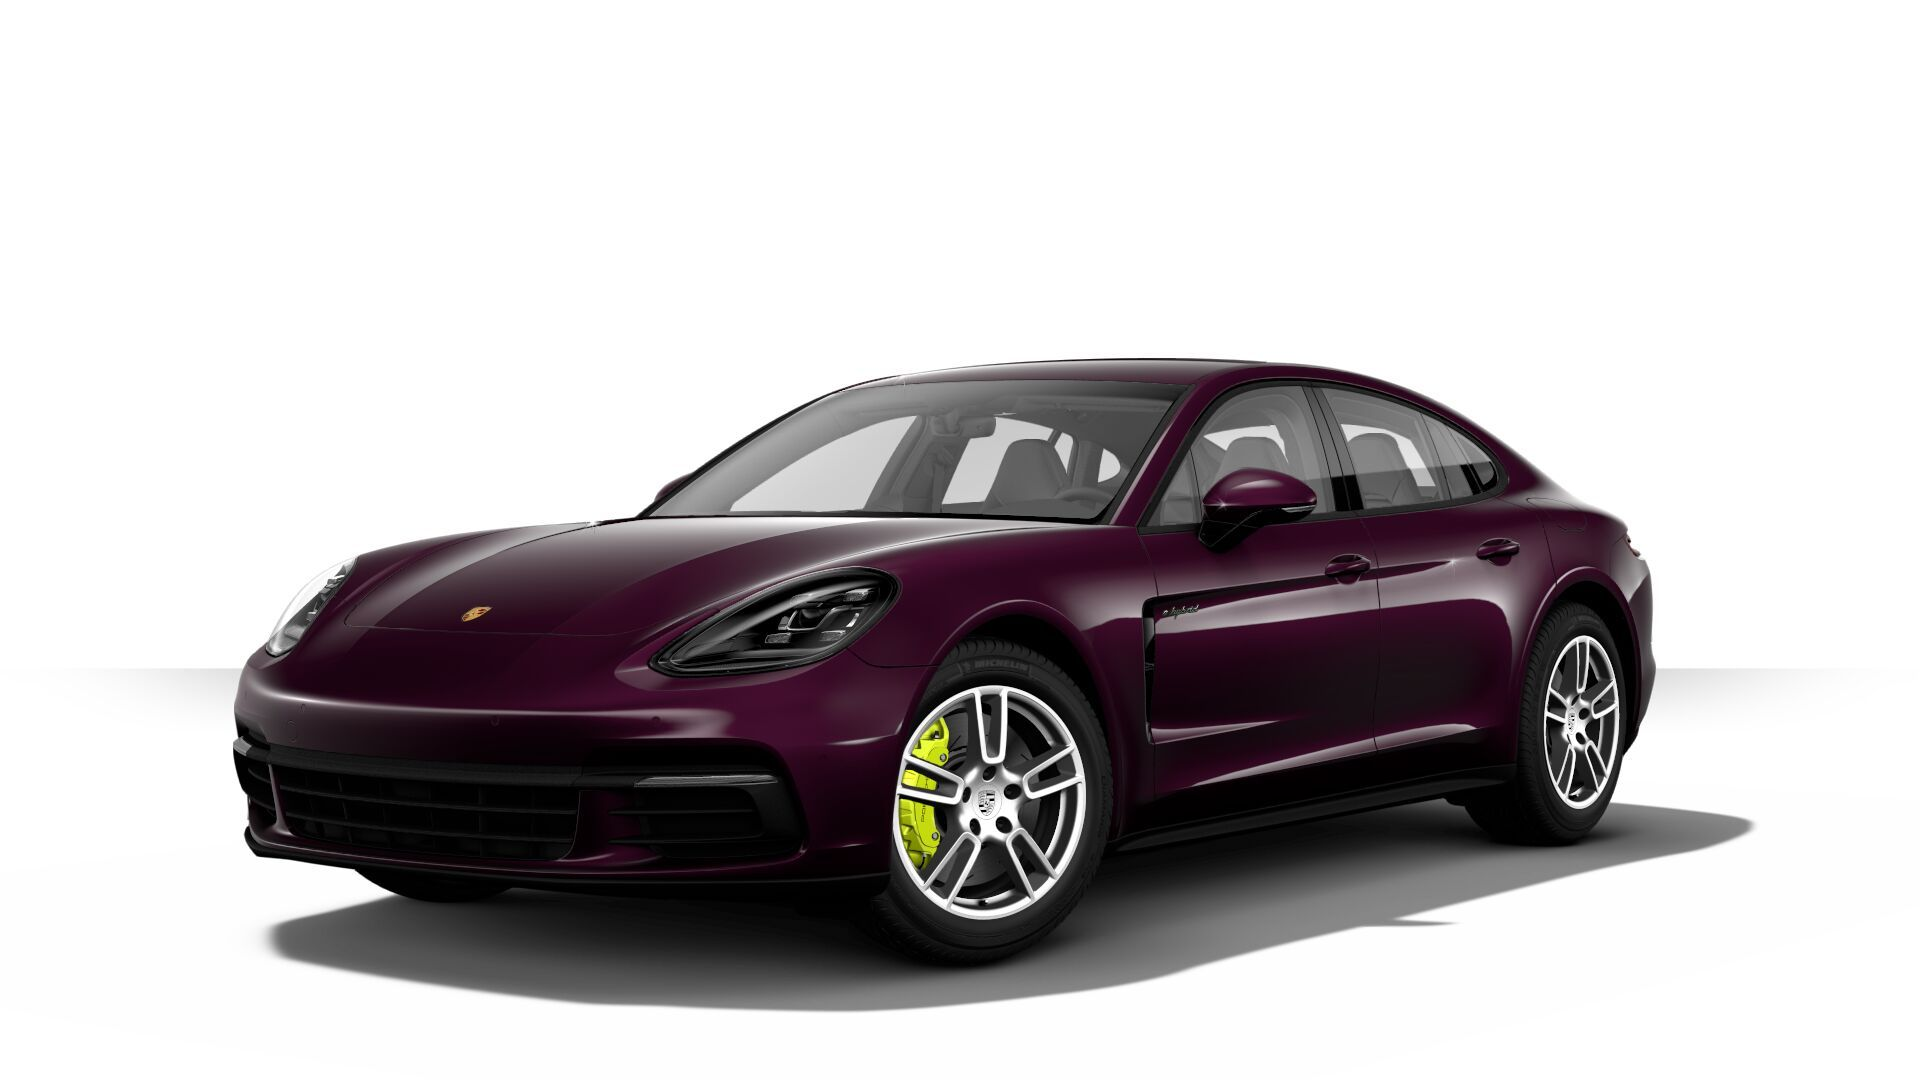 Porsche Panamera 4 EHybrid Makes Global Debut in London